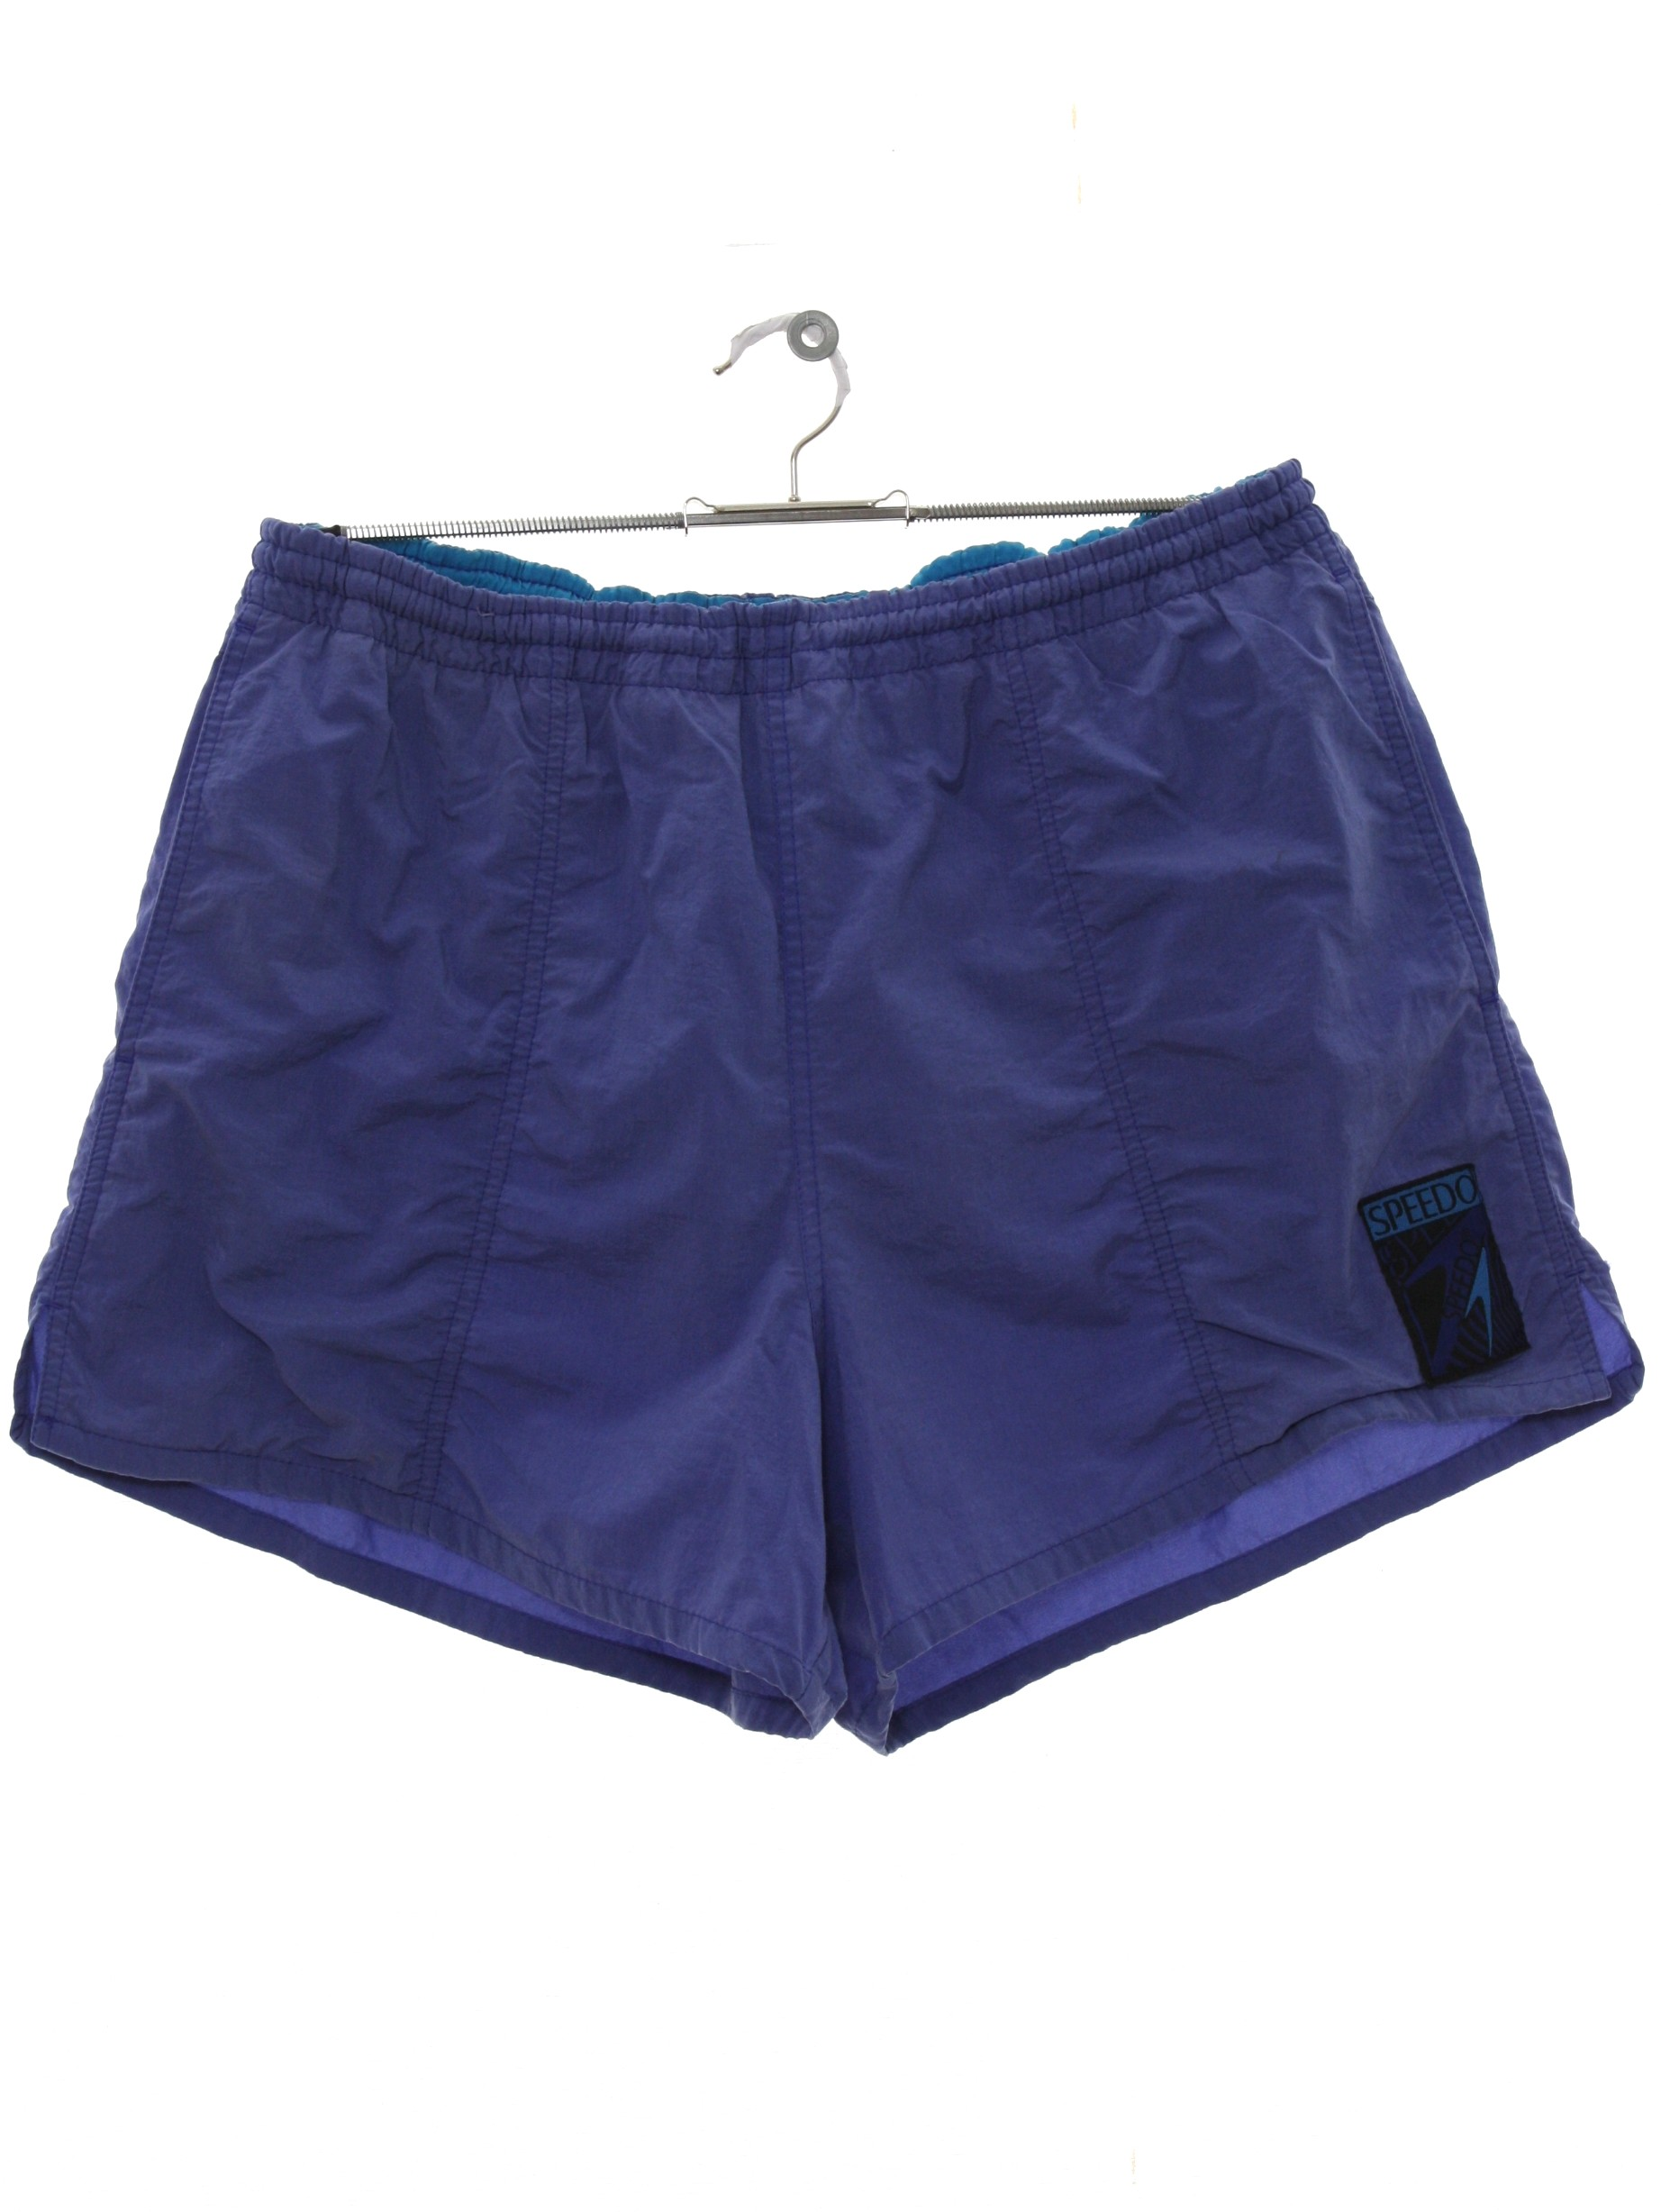 24547194dd Nineties Vintage Swimsuit/Swimwear: 90s -Speedo- Mens periwinkle ...